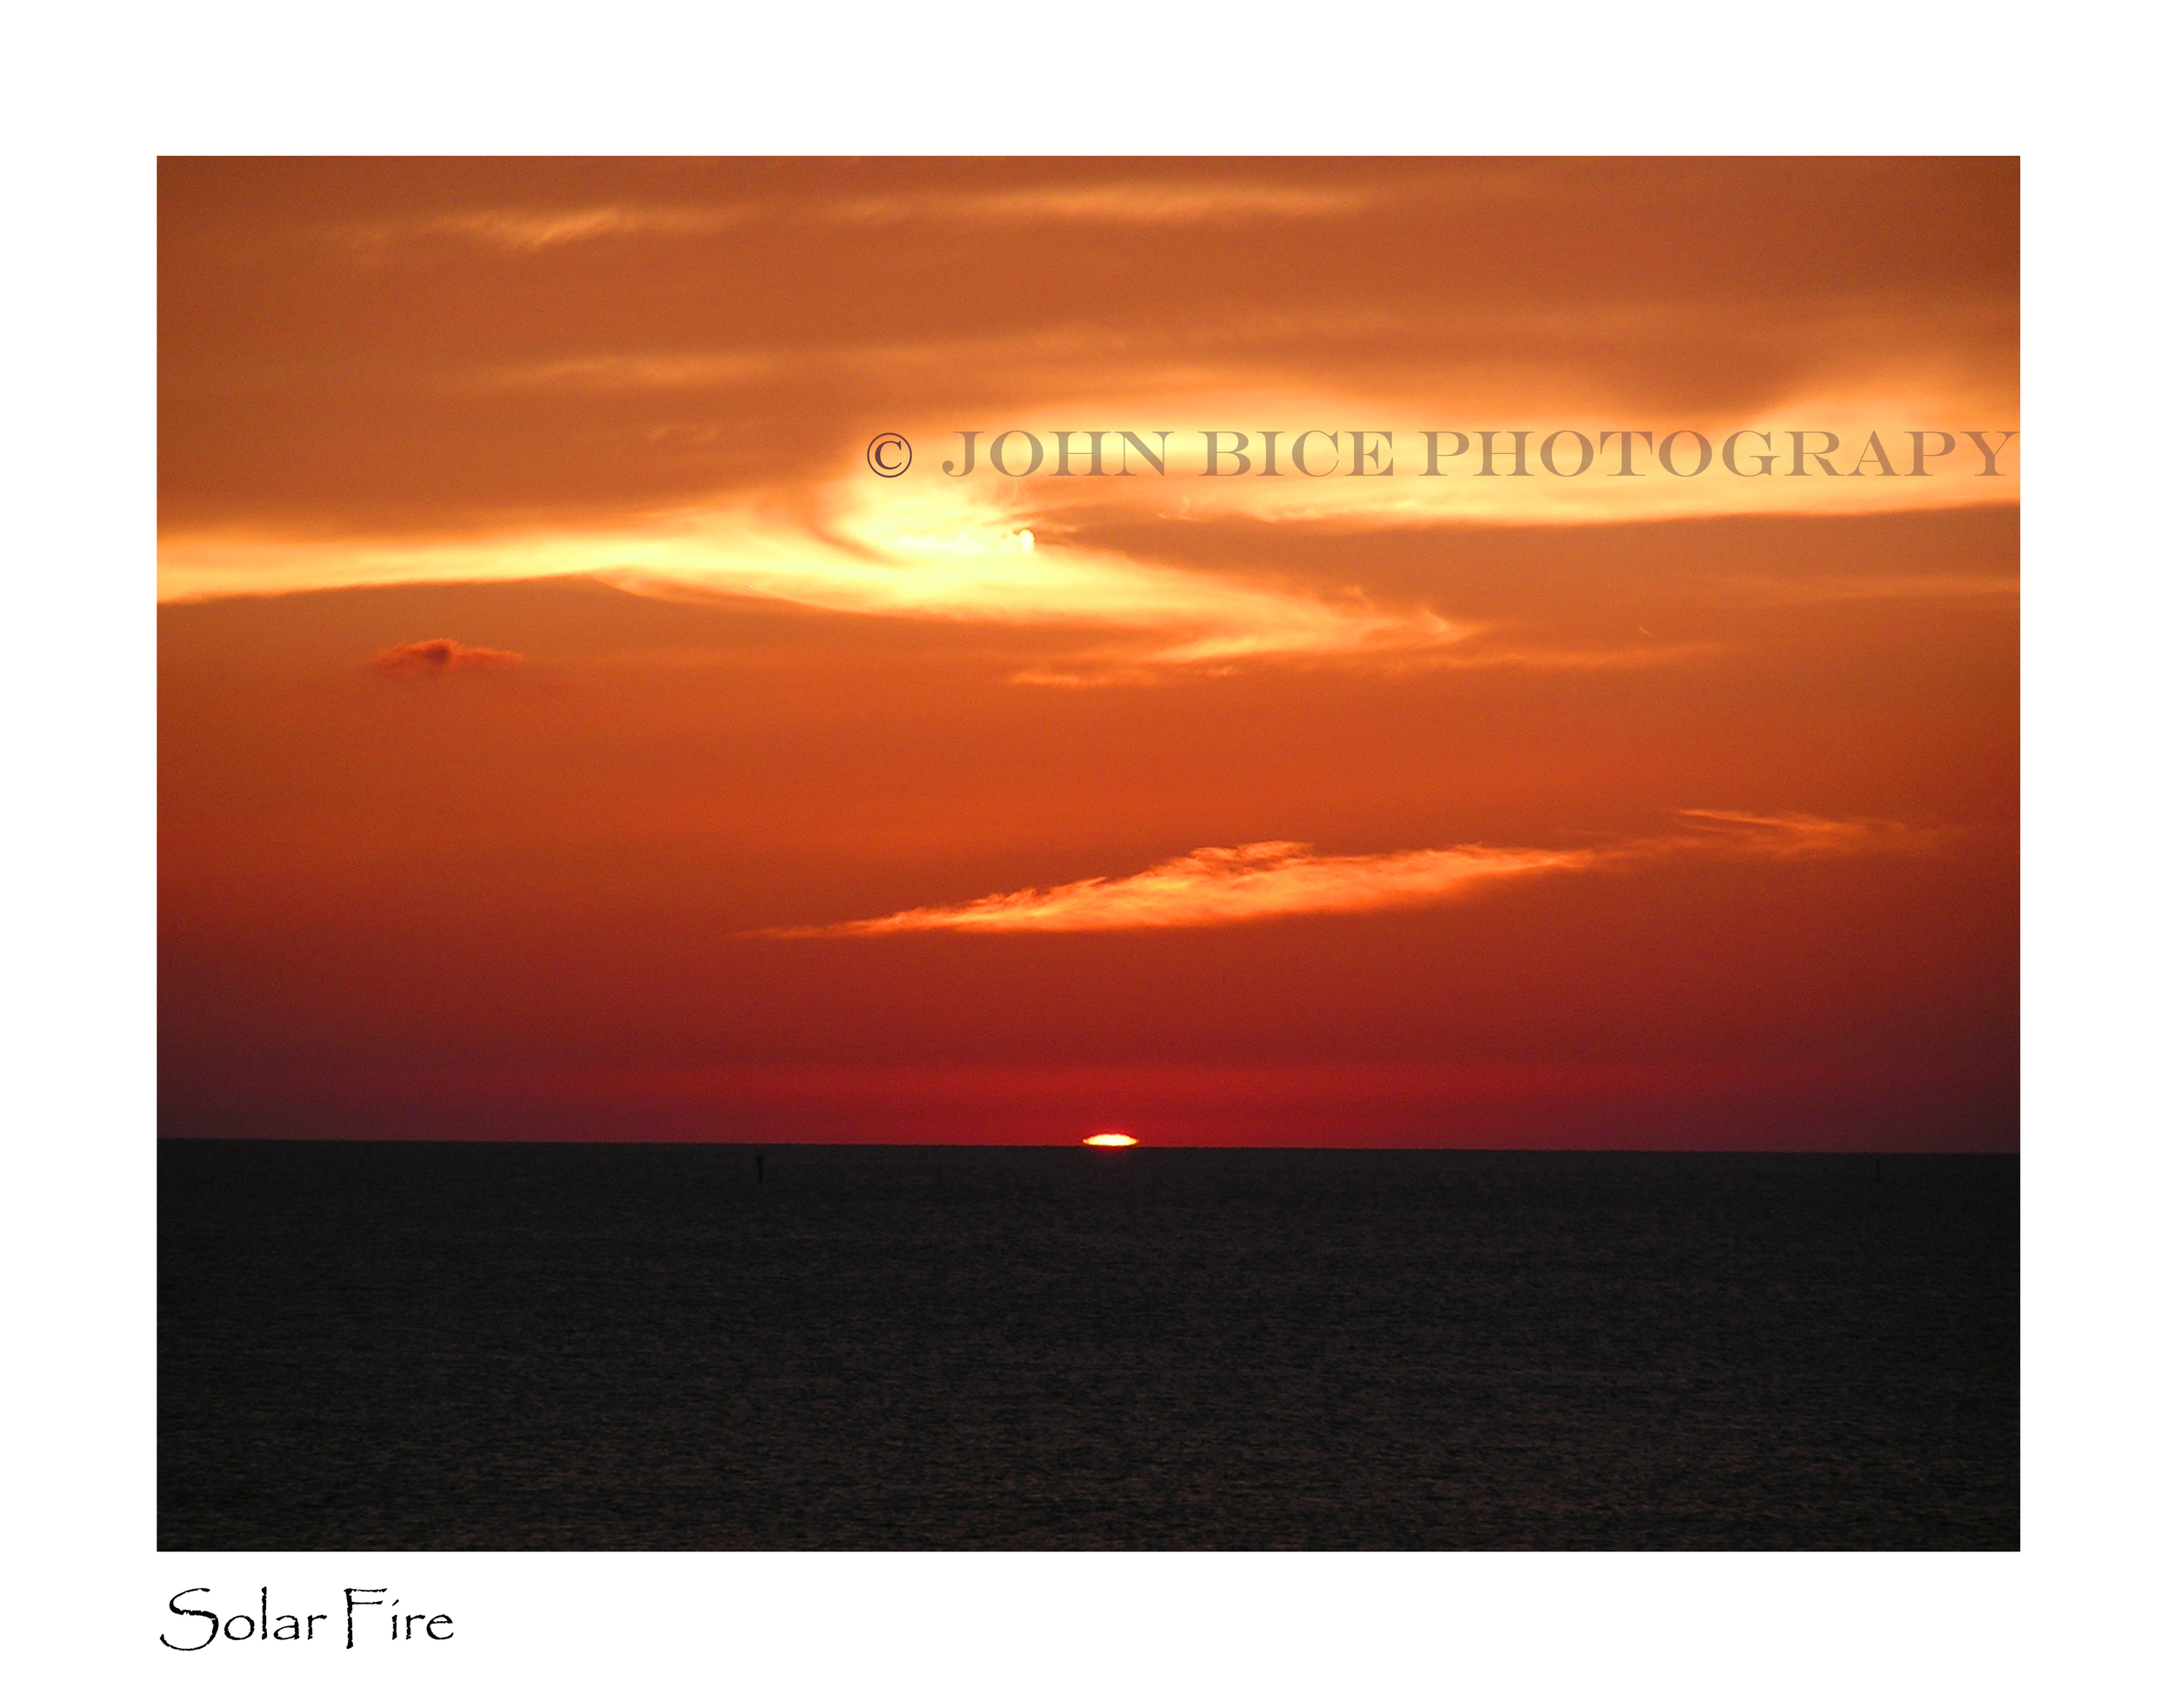 SolarFire.jpg